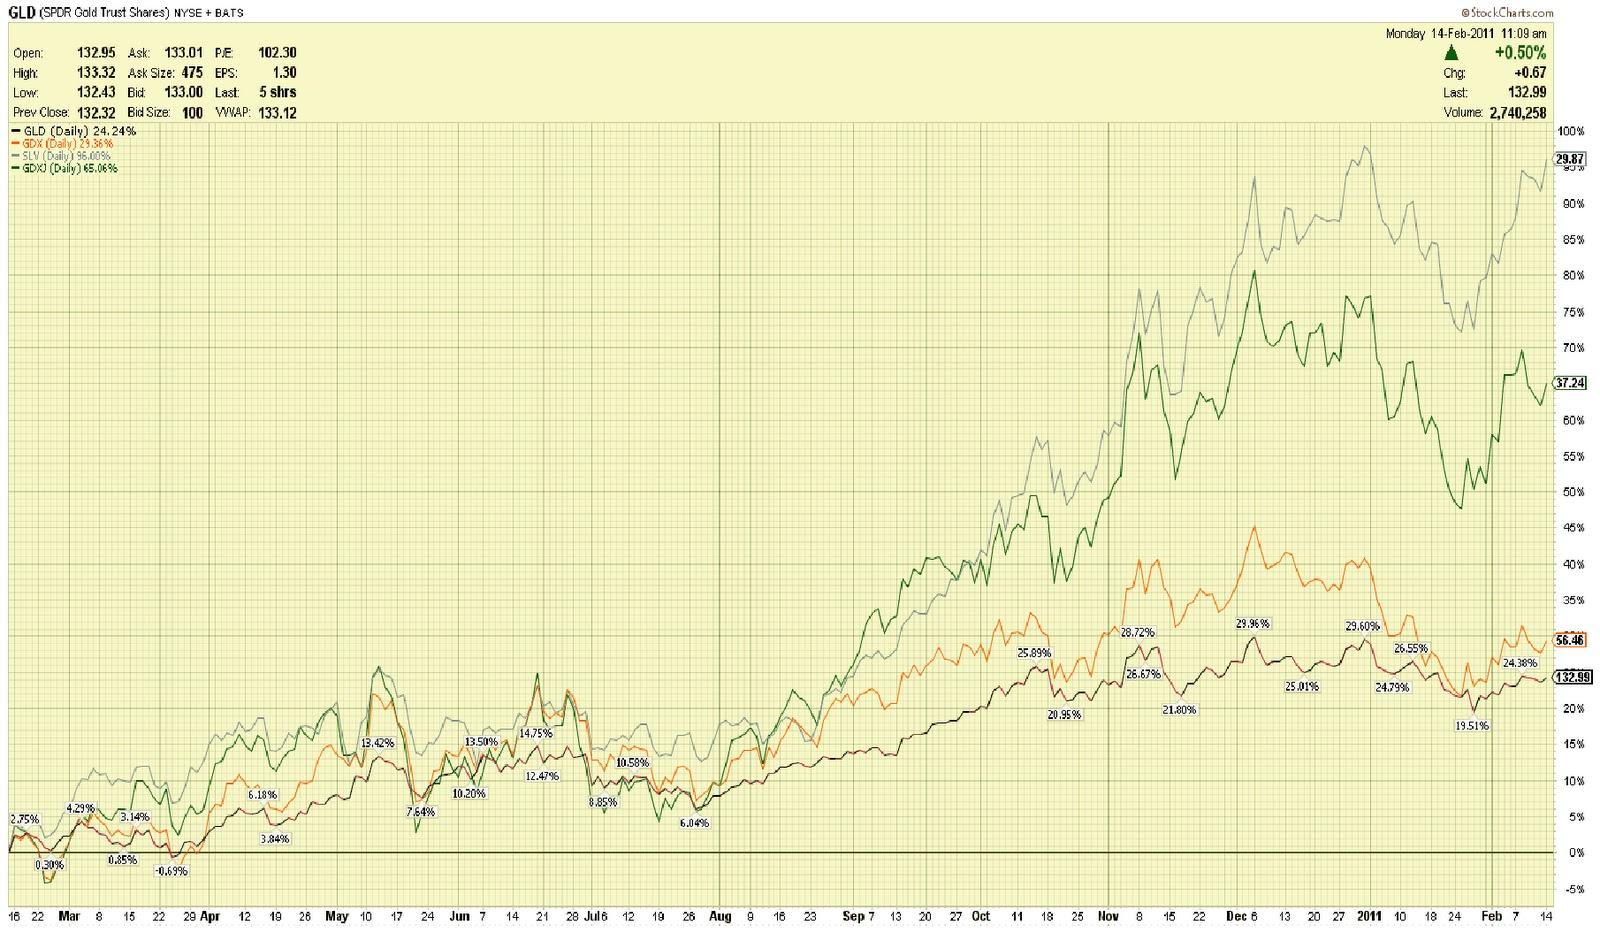 Slv Stock Quote Gold's Price Action Creates Deja Vu Moment  T3Live